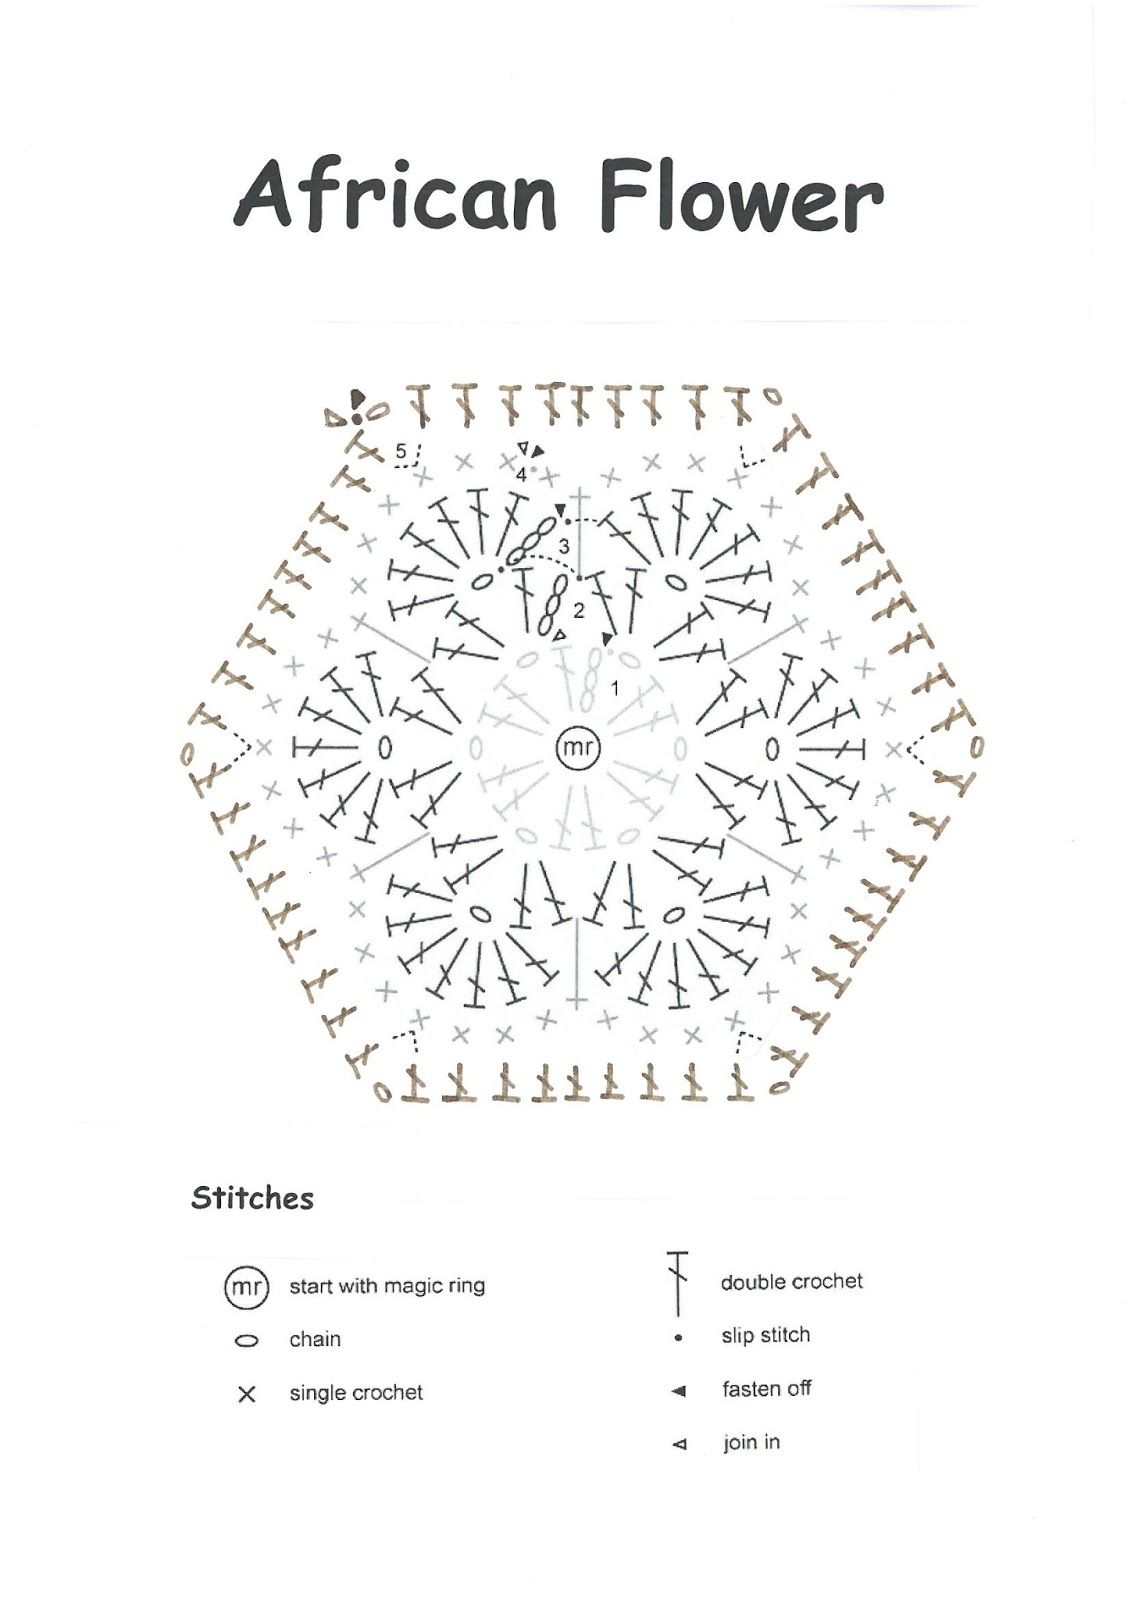 Hexa14 11311600 Crochet Squares And Motifs Pinterest Double Diagram